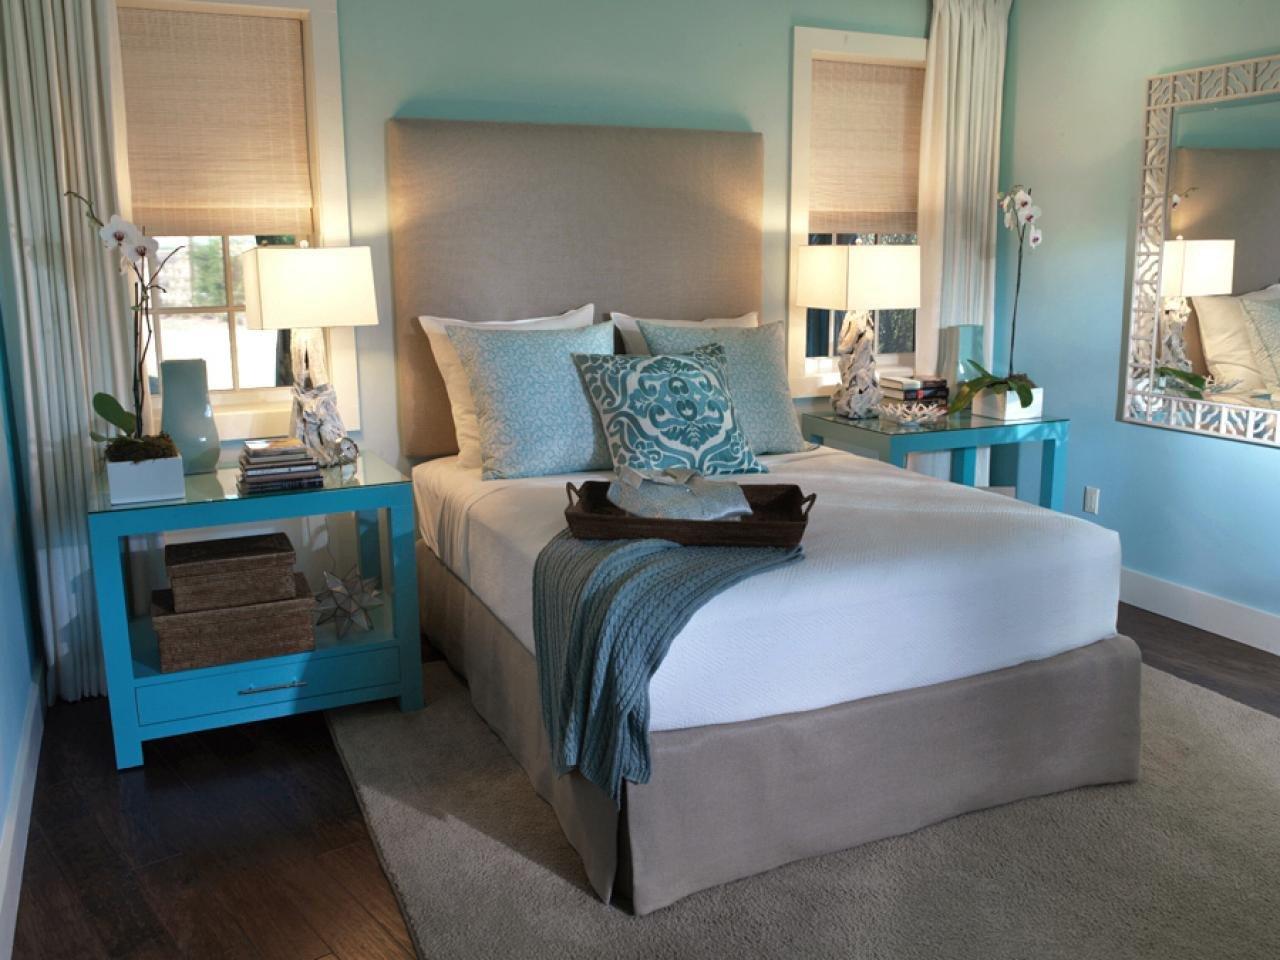 Decor Ideas for Master Bedroom New Hgtv Green Home 2009 Master Bedroom Details Hgtv Green Home 2009